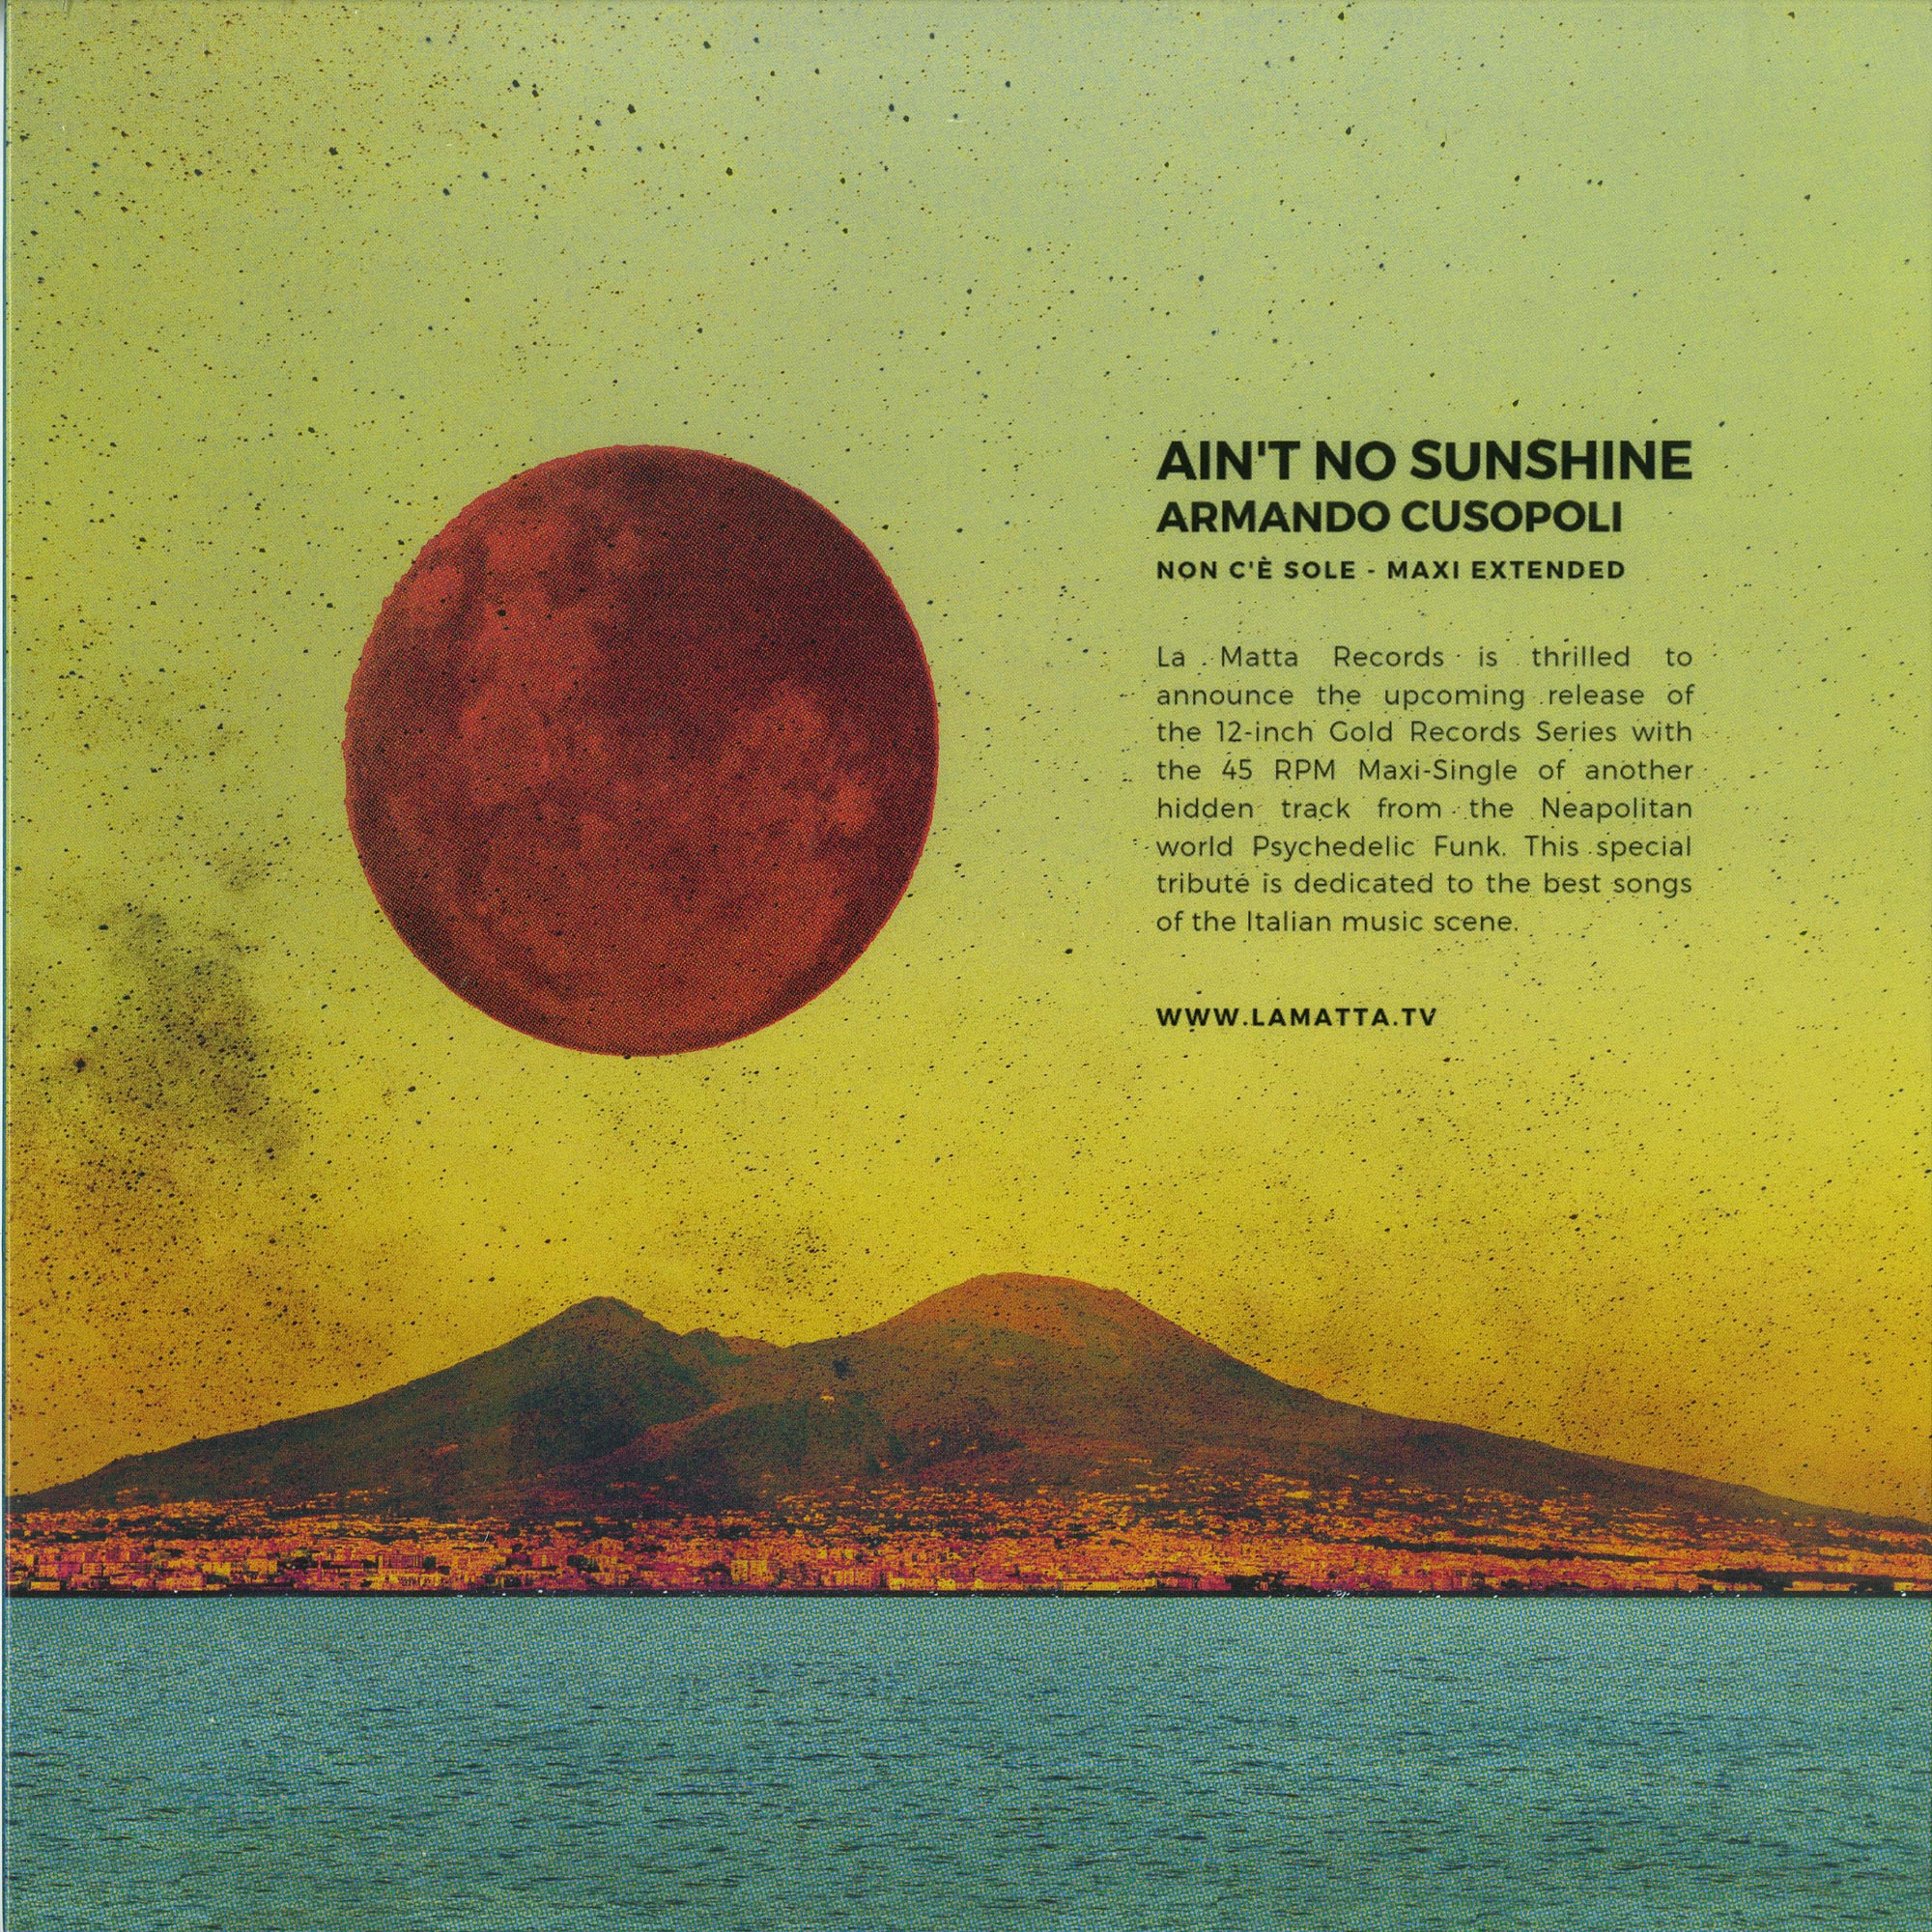 Armando Cusopoli - AINT NO SUNSHINE